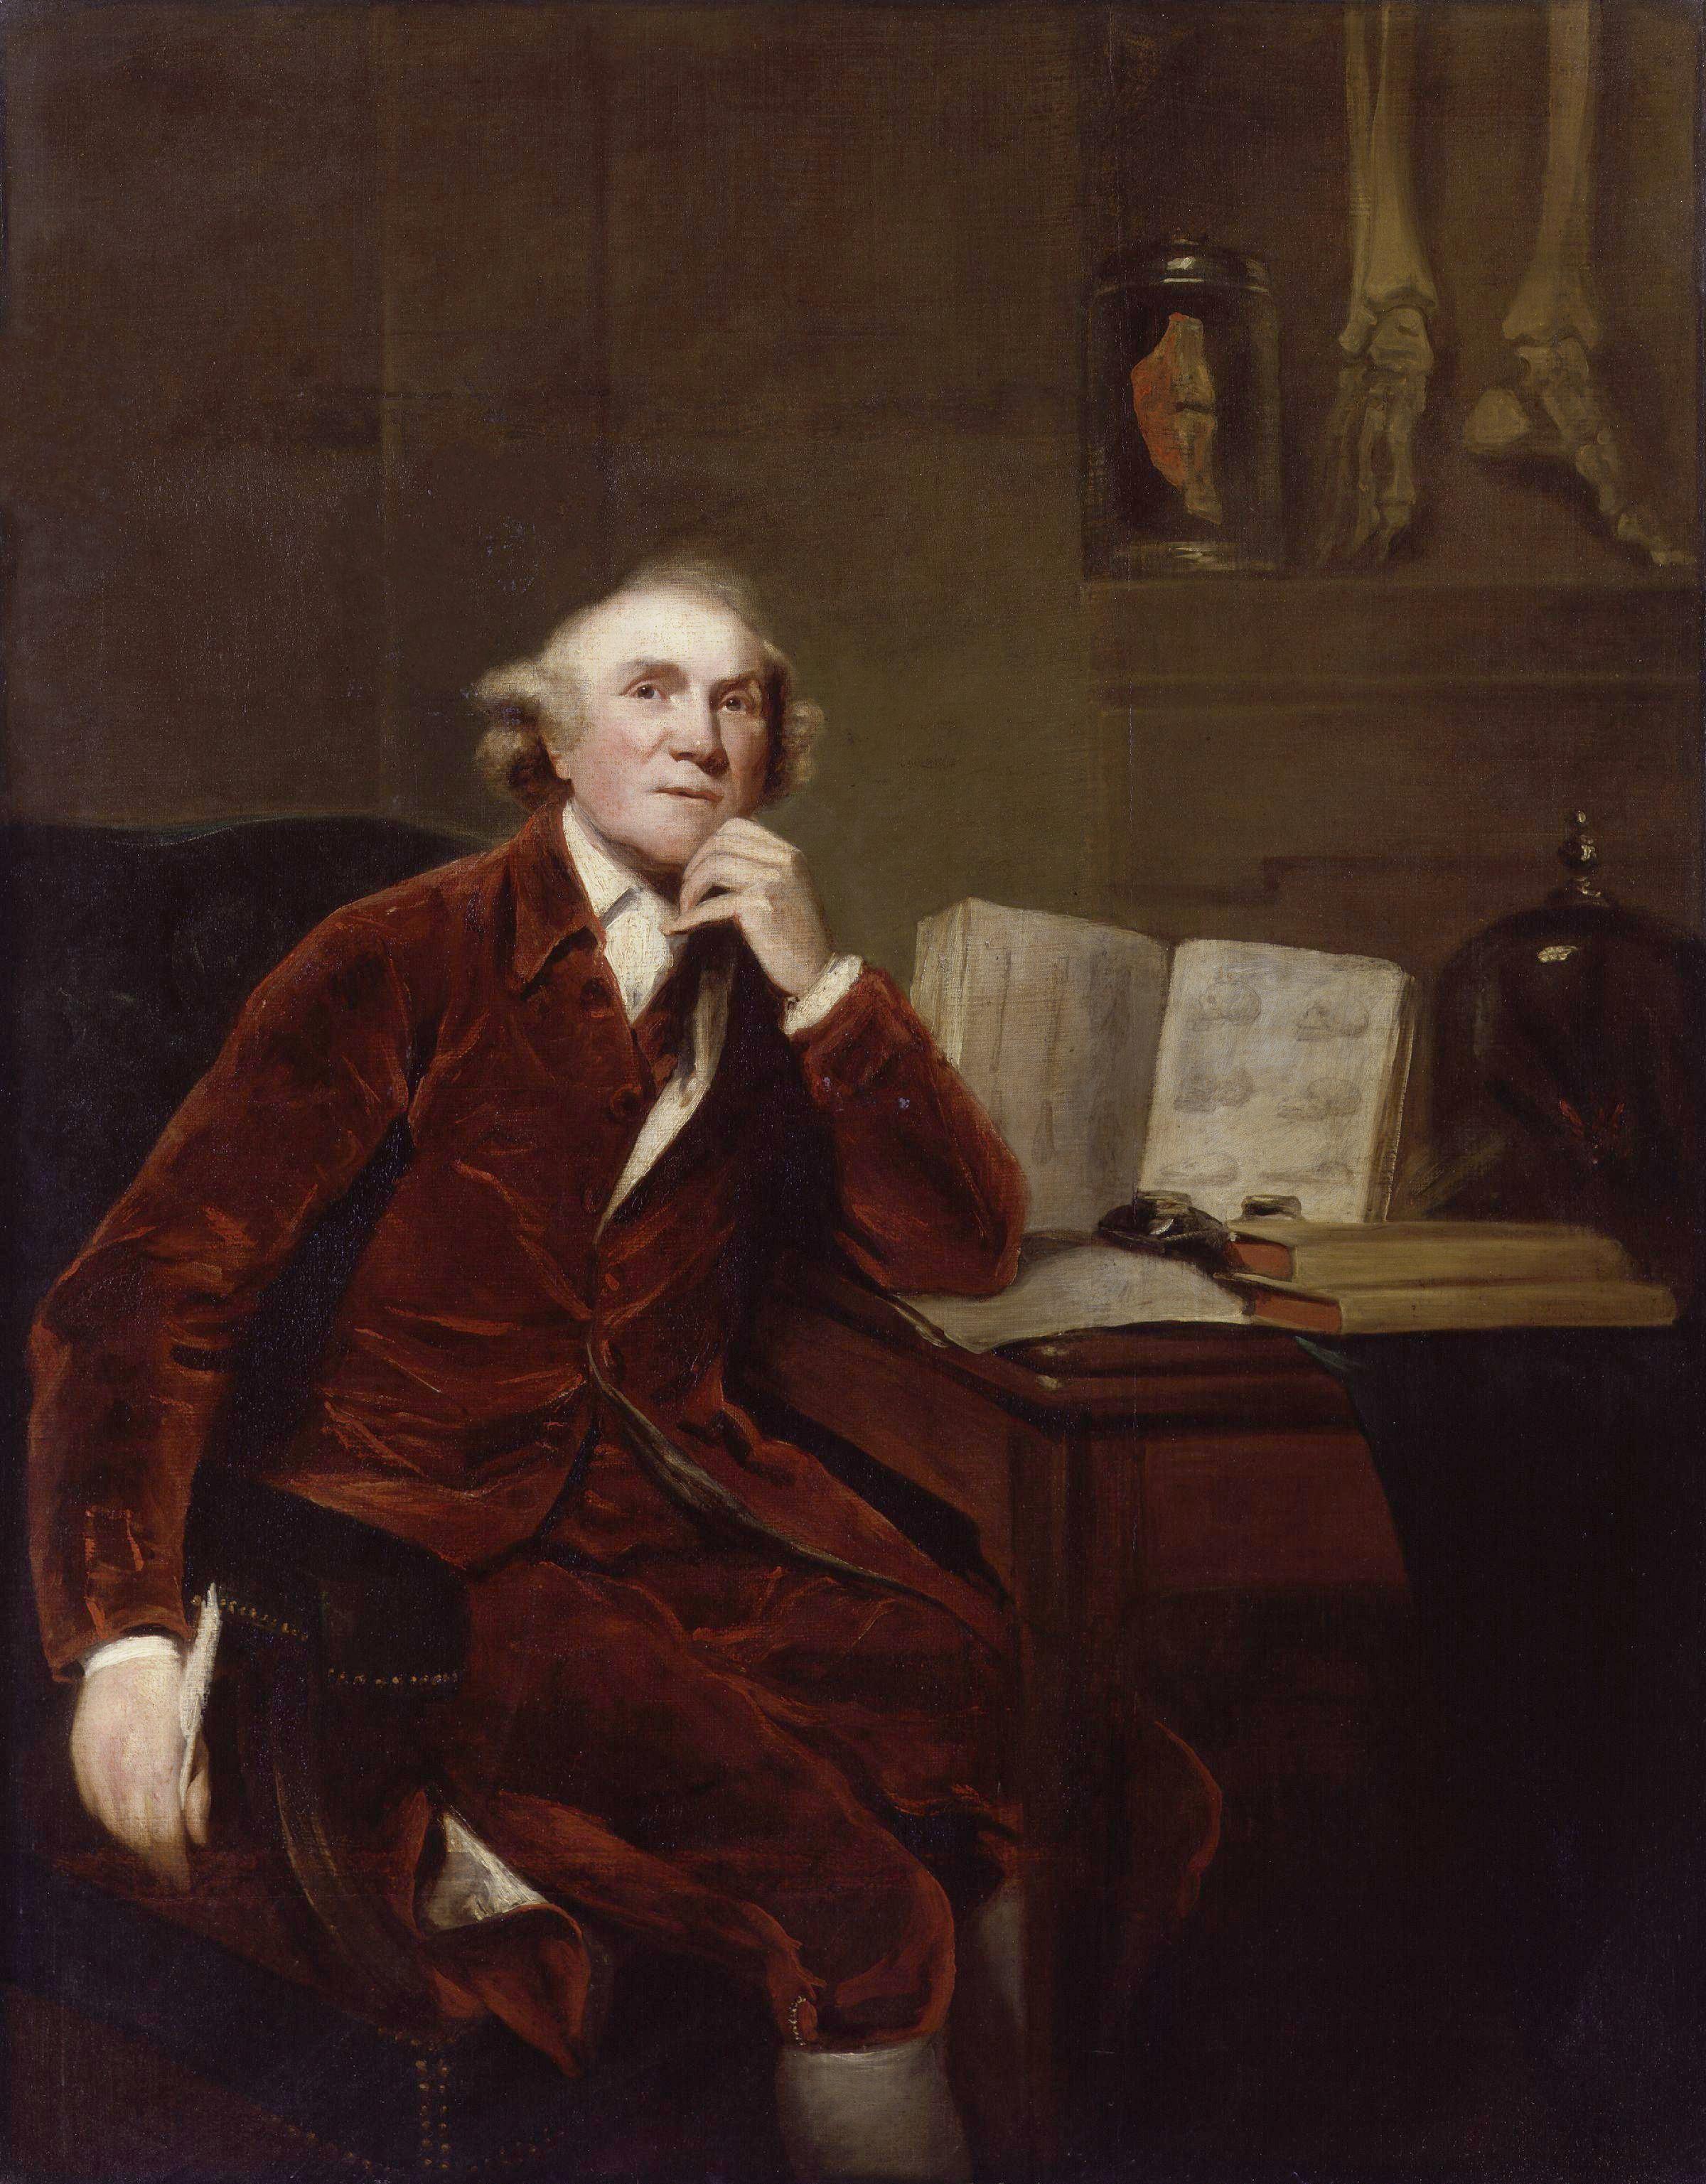 John Hunter by John Jackson. John Jackson [Public domain], via Wikimedia Commons.